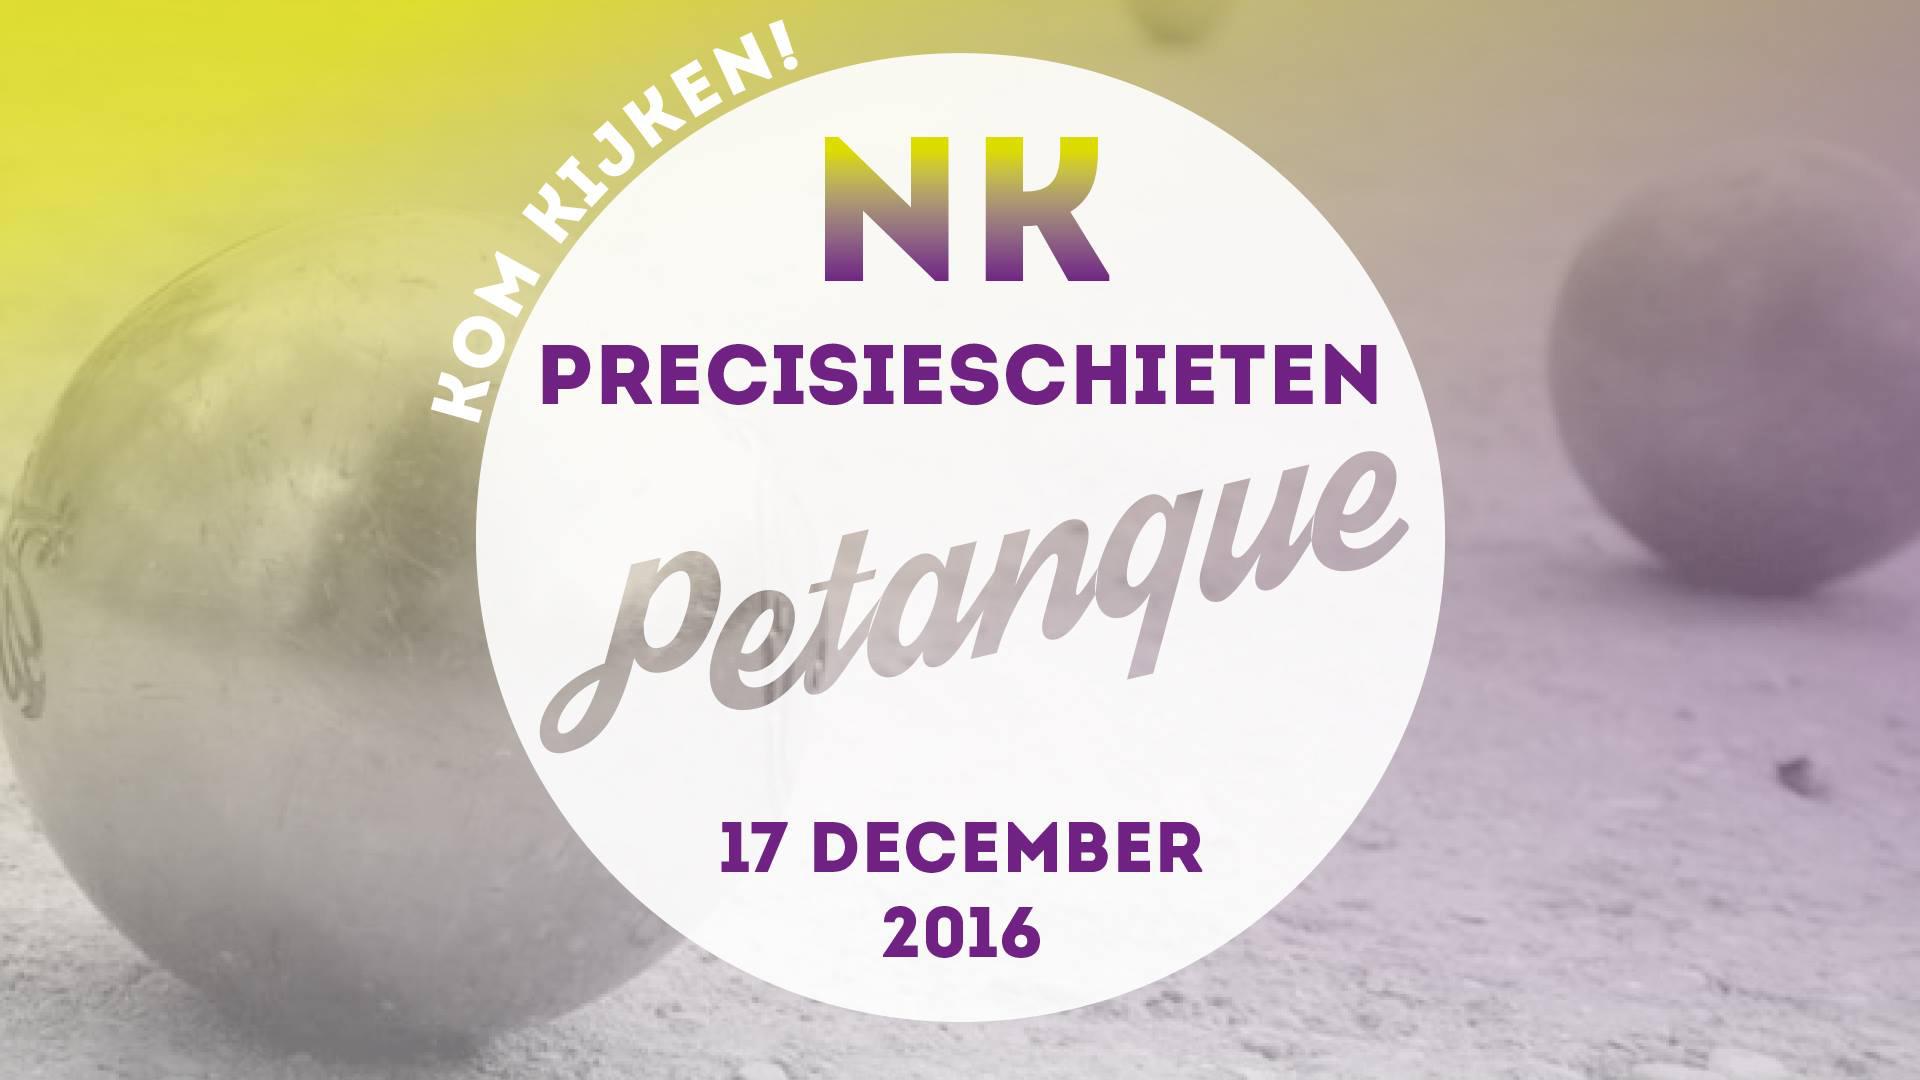 NK Petanque precisieschieten